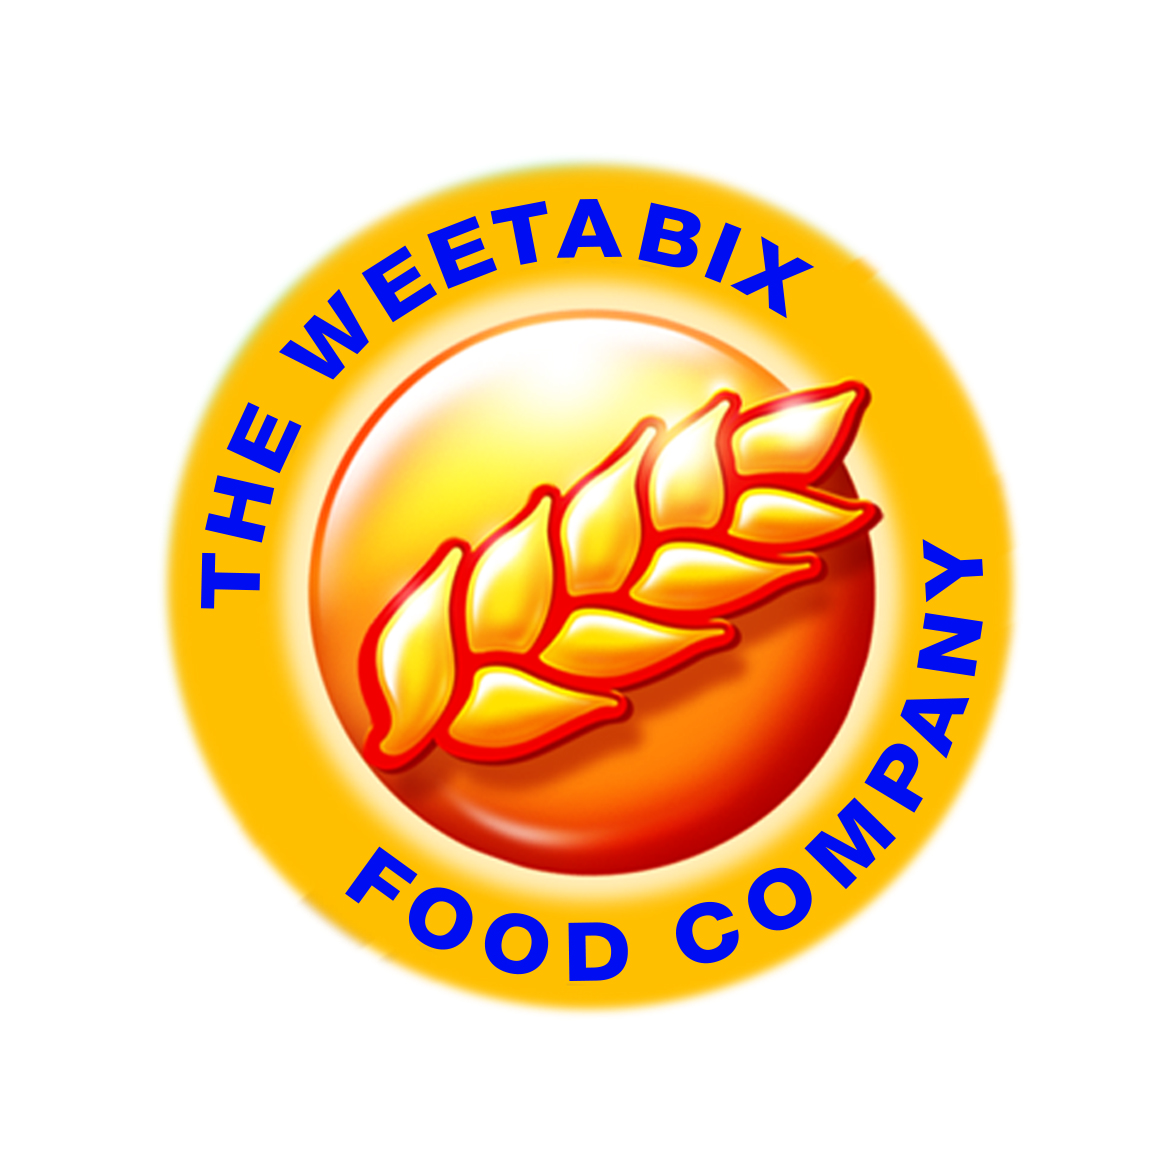 Weetabix Ltd